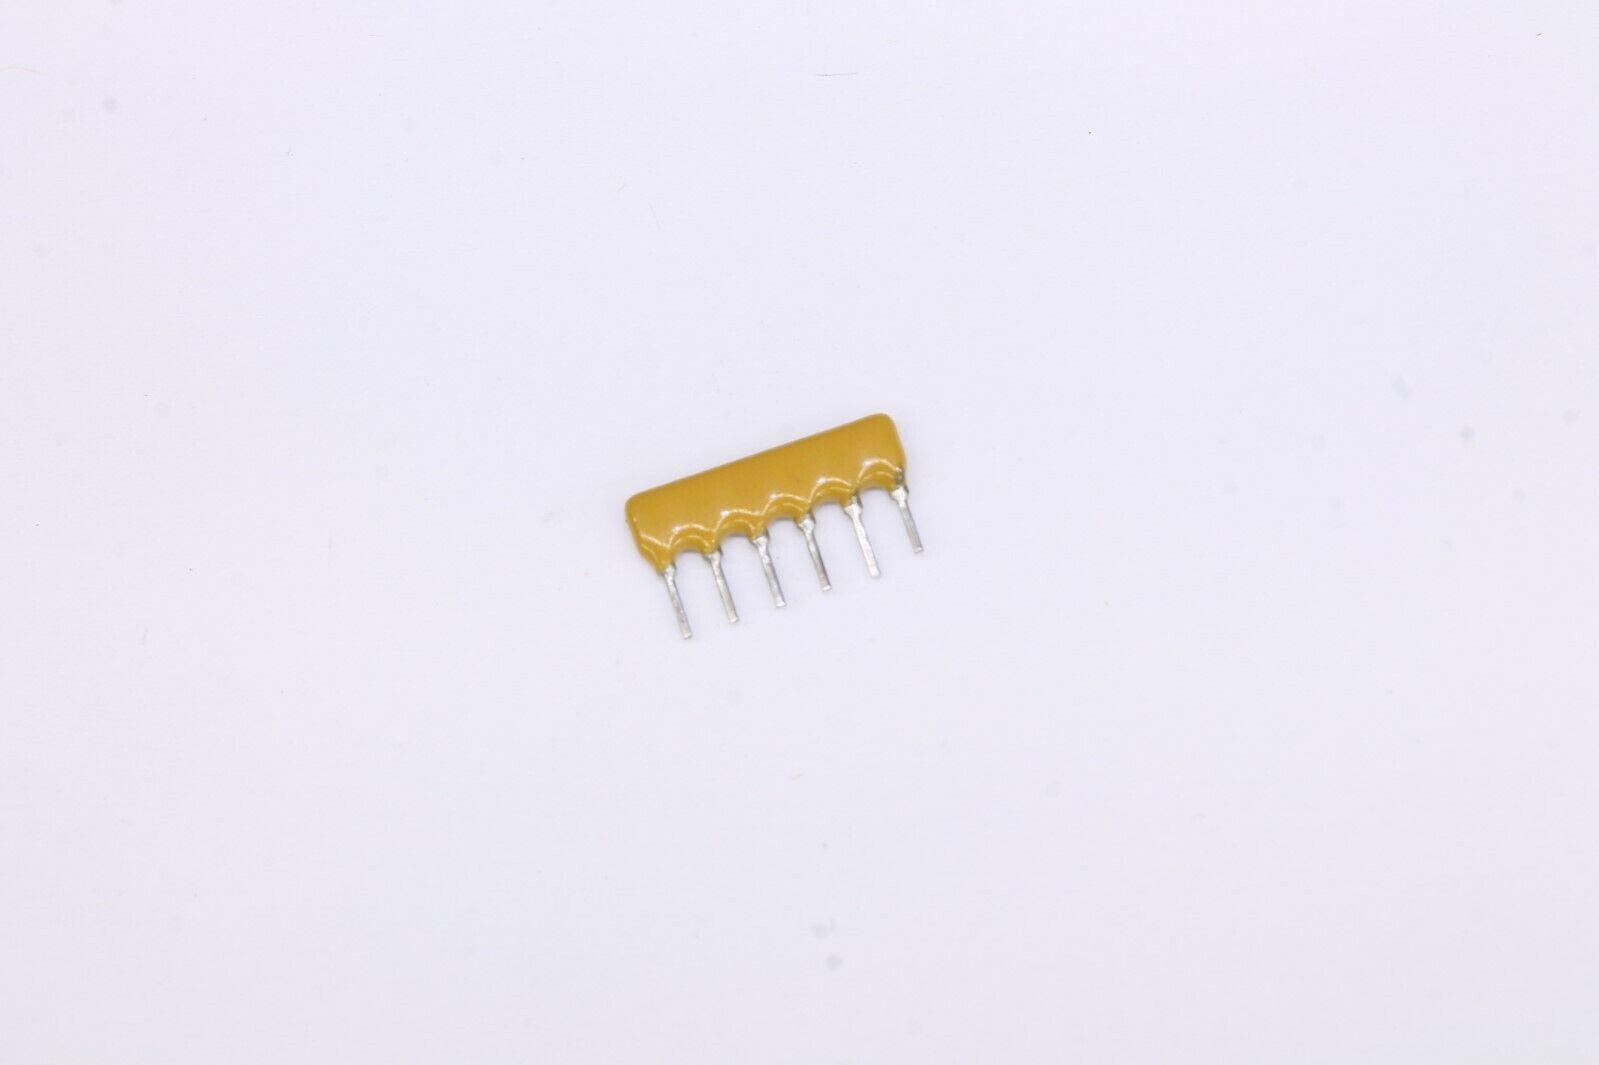 500pcs RM063 100R~1M 101 102 103 104 1K 10K 100K Trim Pot Trimmer Potentiometer